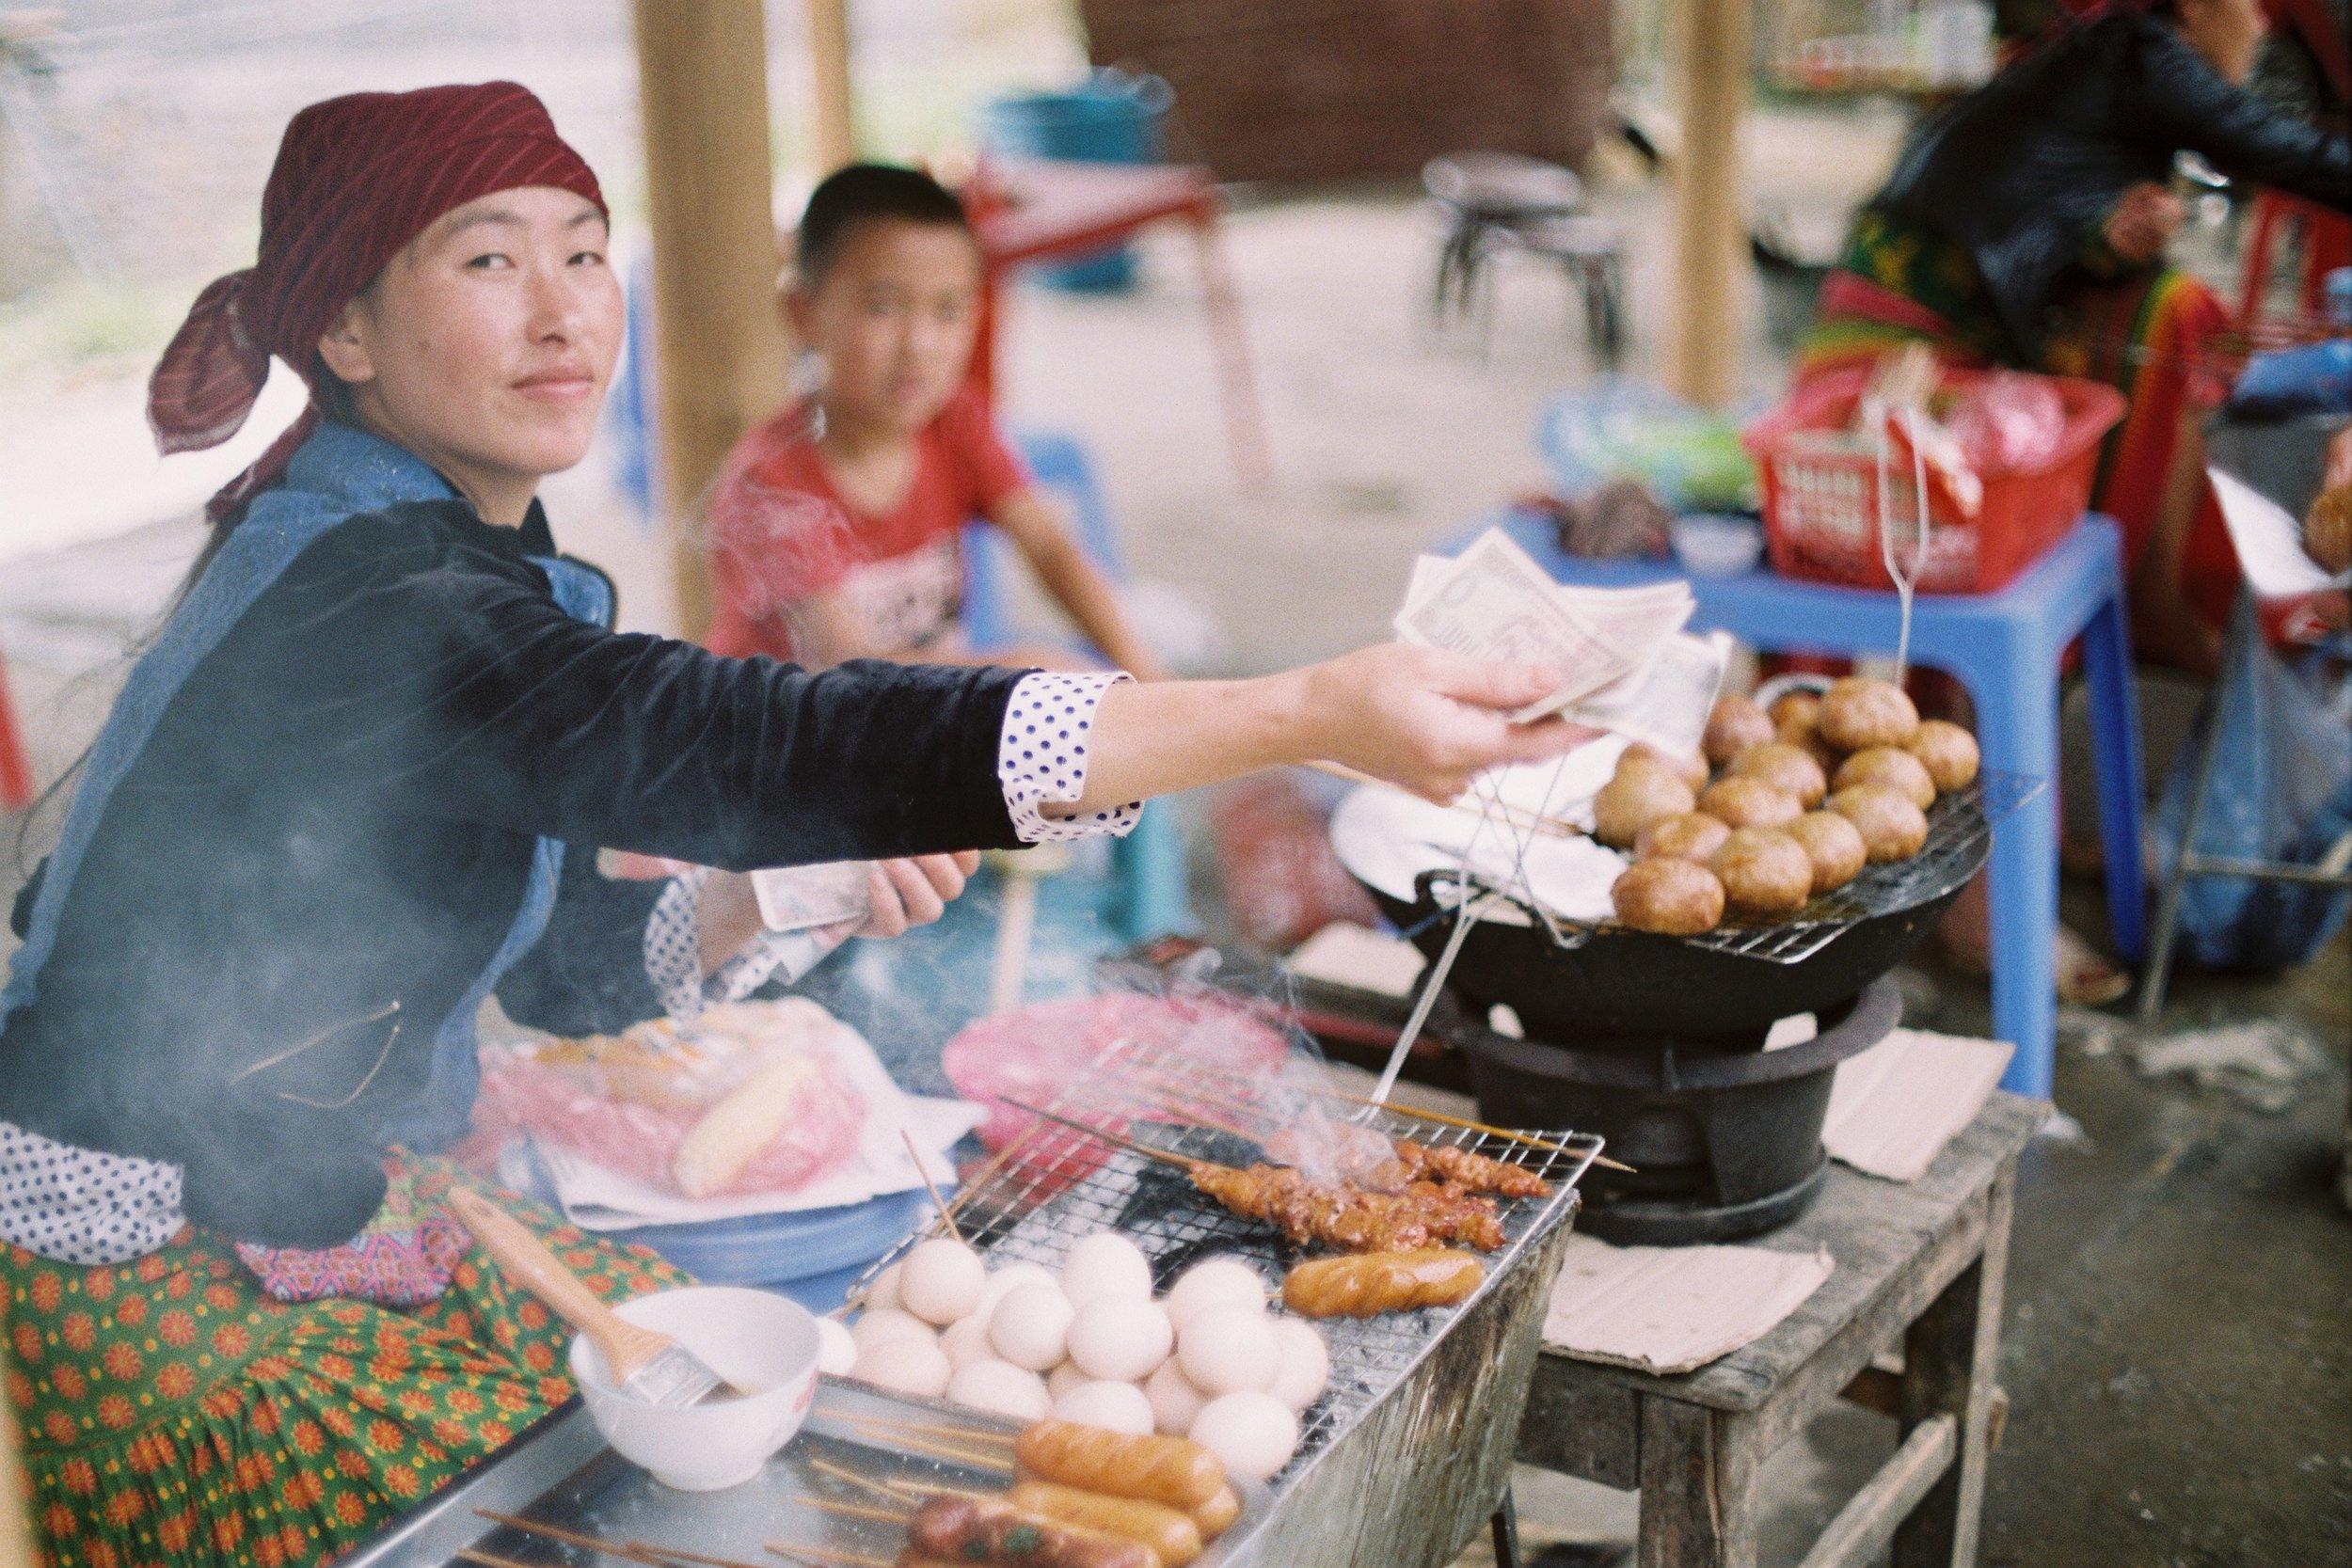 vietnam-food-street-frankie-shutterbug-1060470-unsplash.jpg